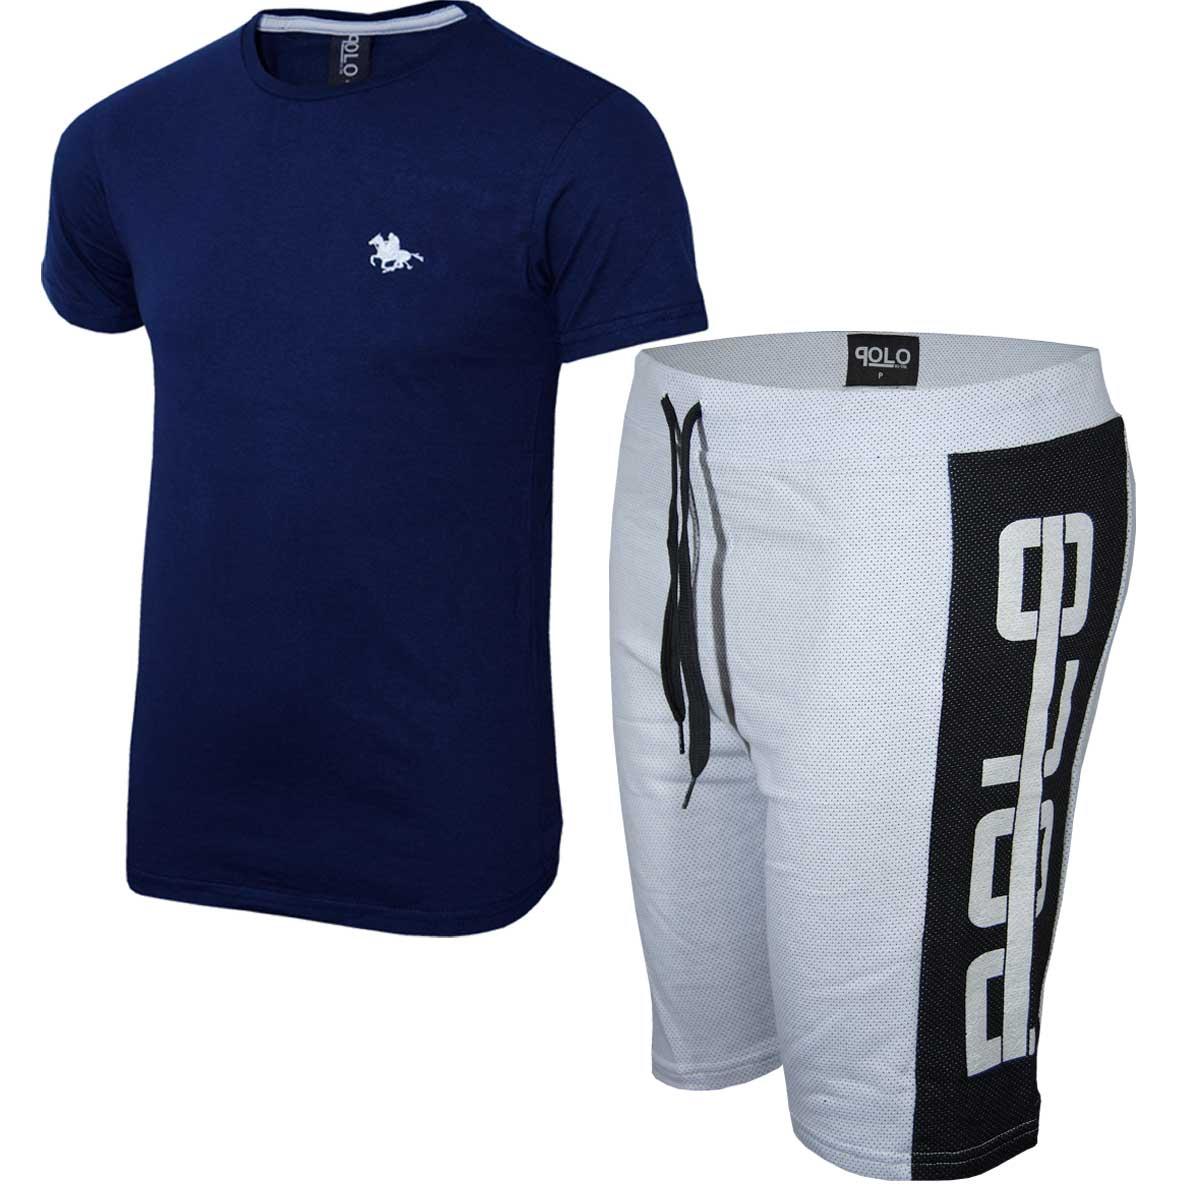 Kit Camiseta Marinho e Bermuda Branca Polo RG518